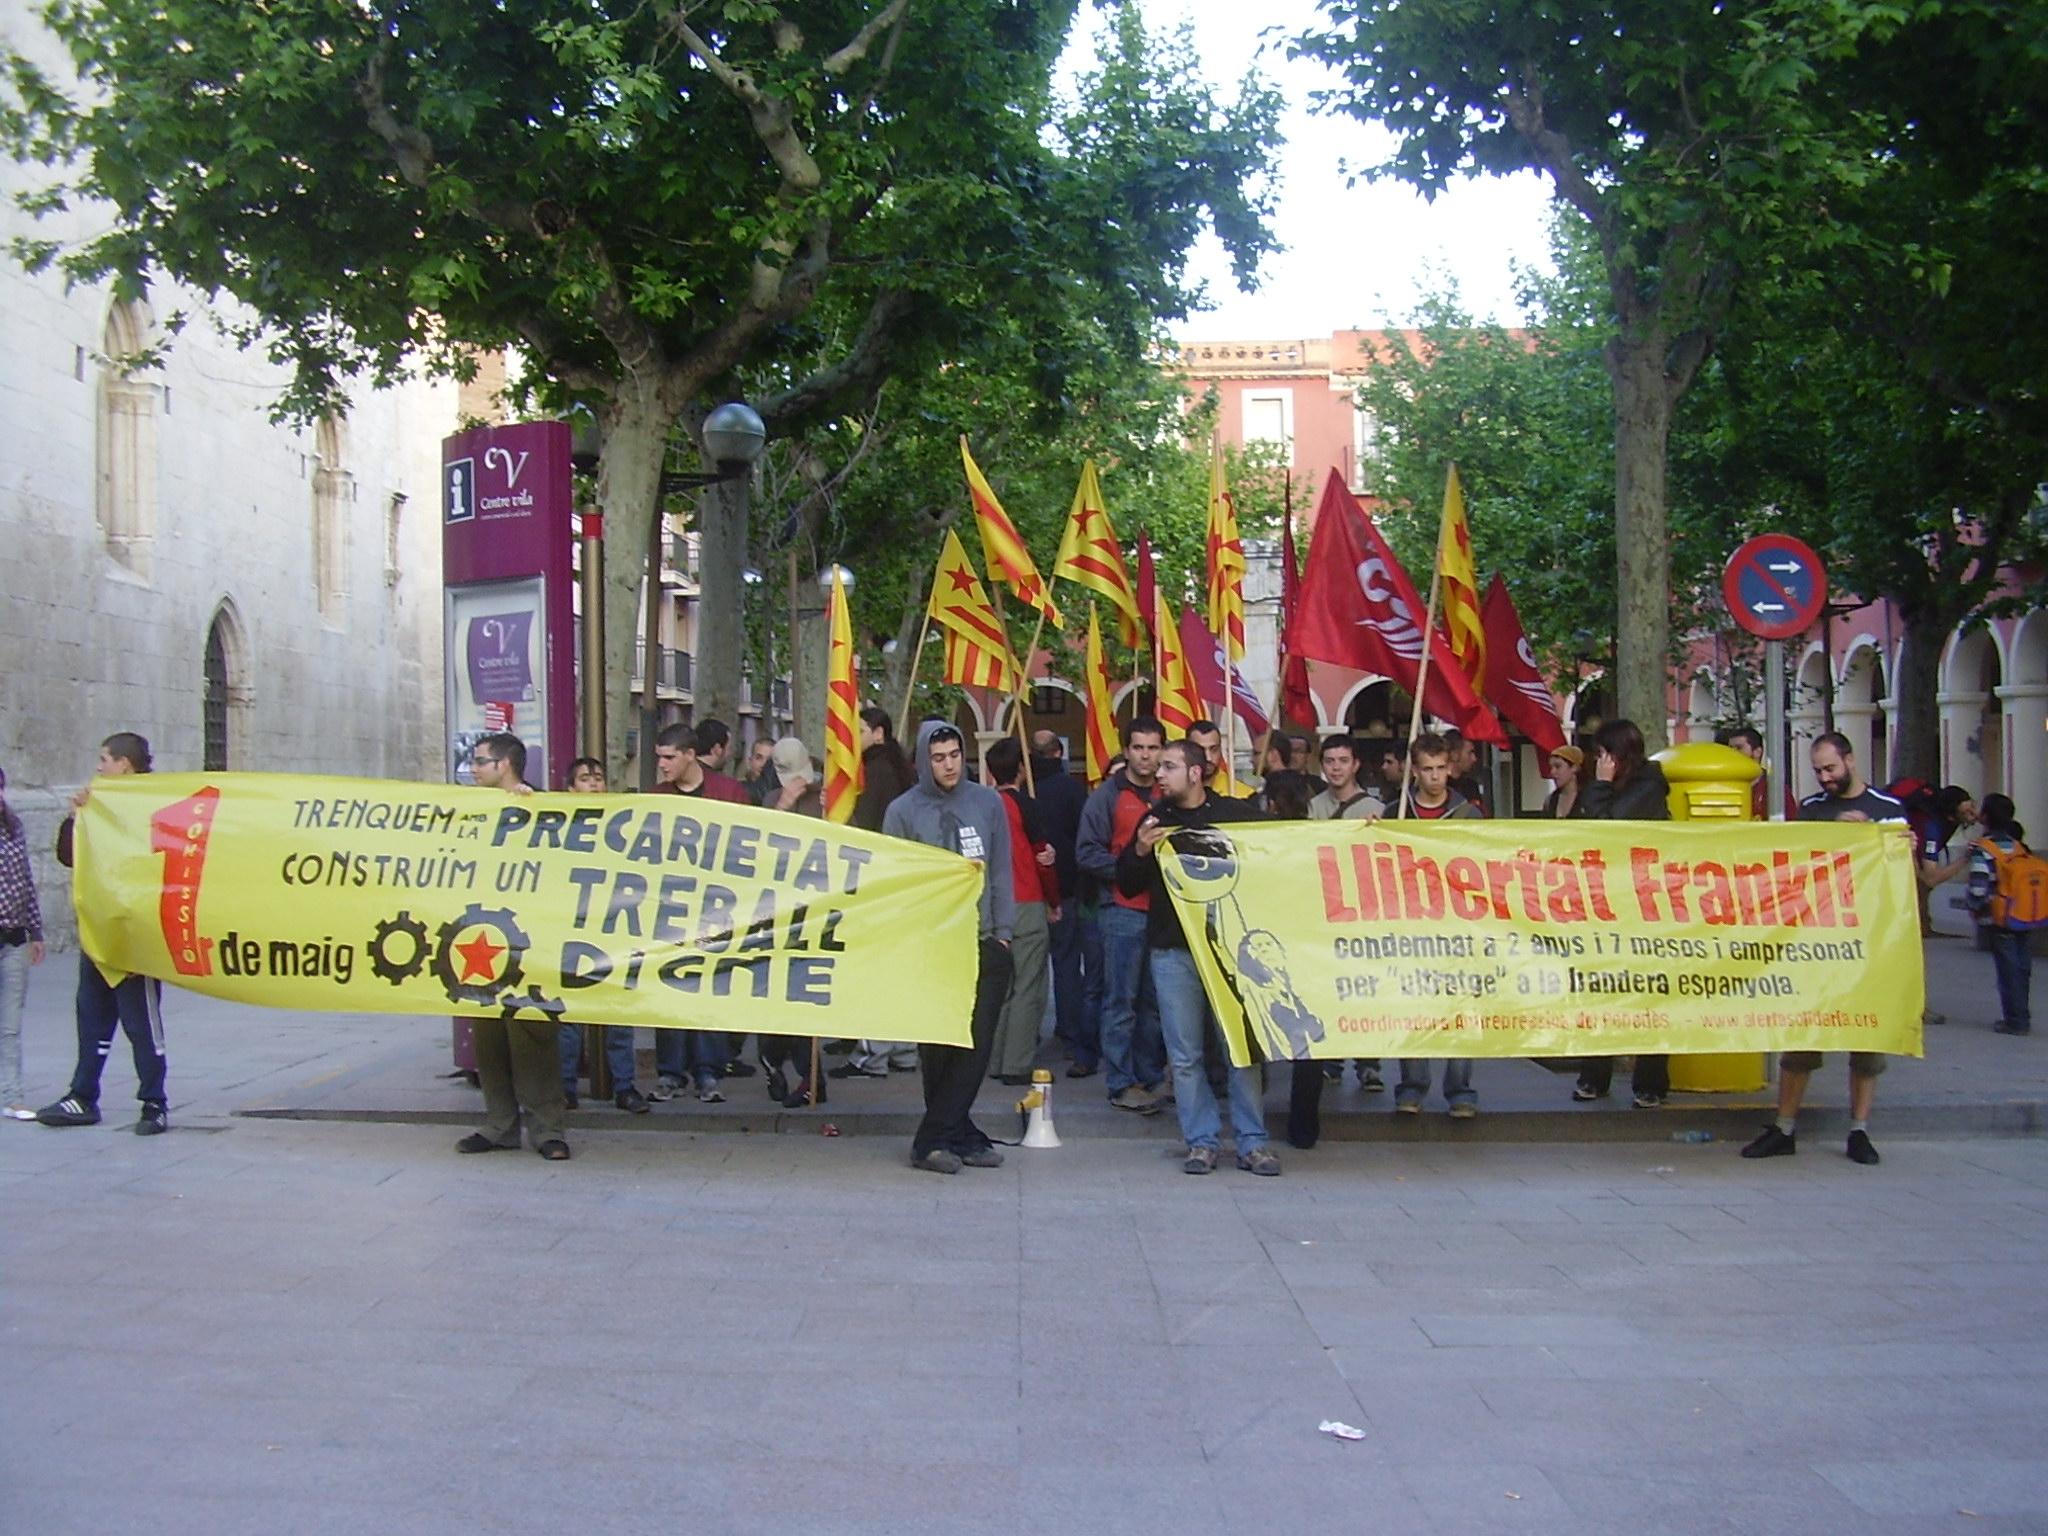 http://barcelona.indymedia.org/usermedia/image/2/large/P1280041.JPG